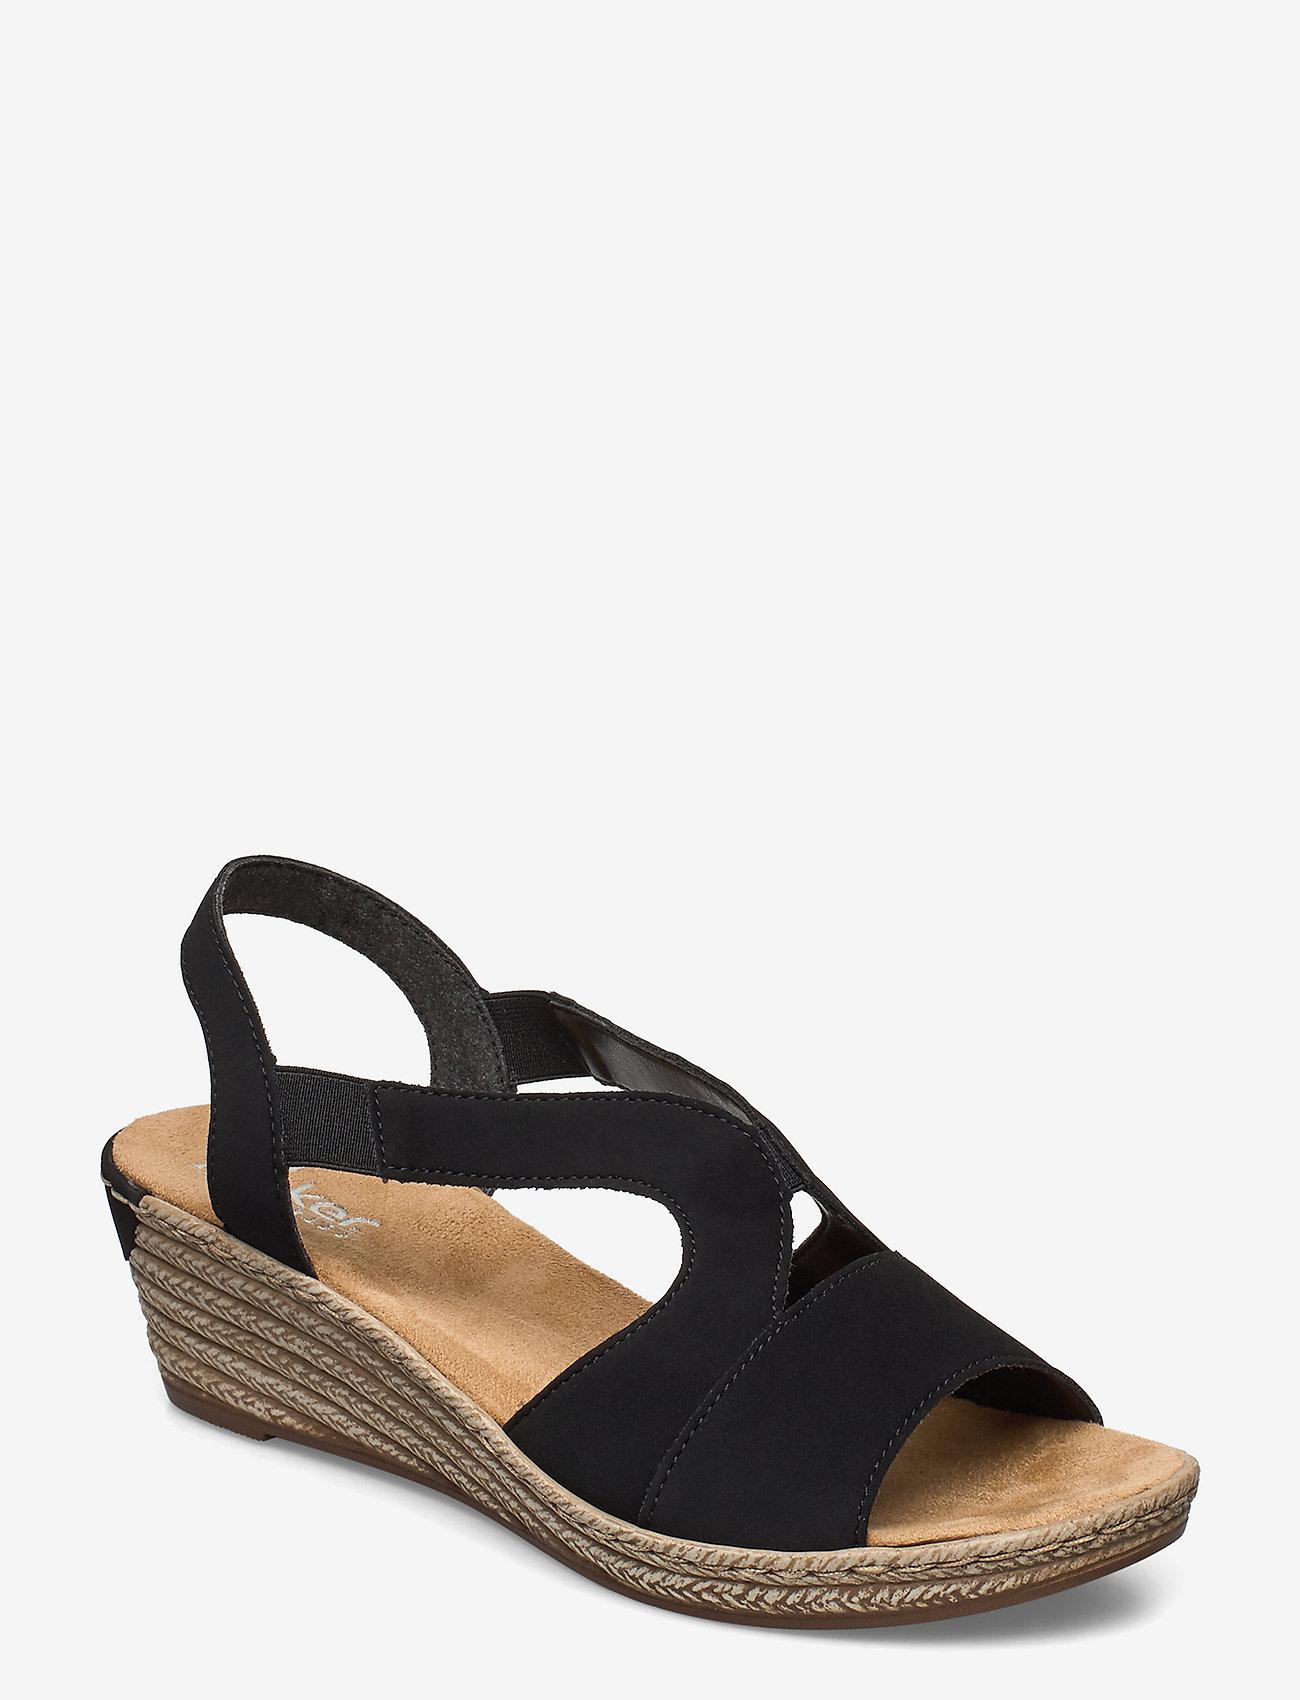 Rieker - 62429-00 - heeled espadrilles - black